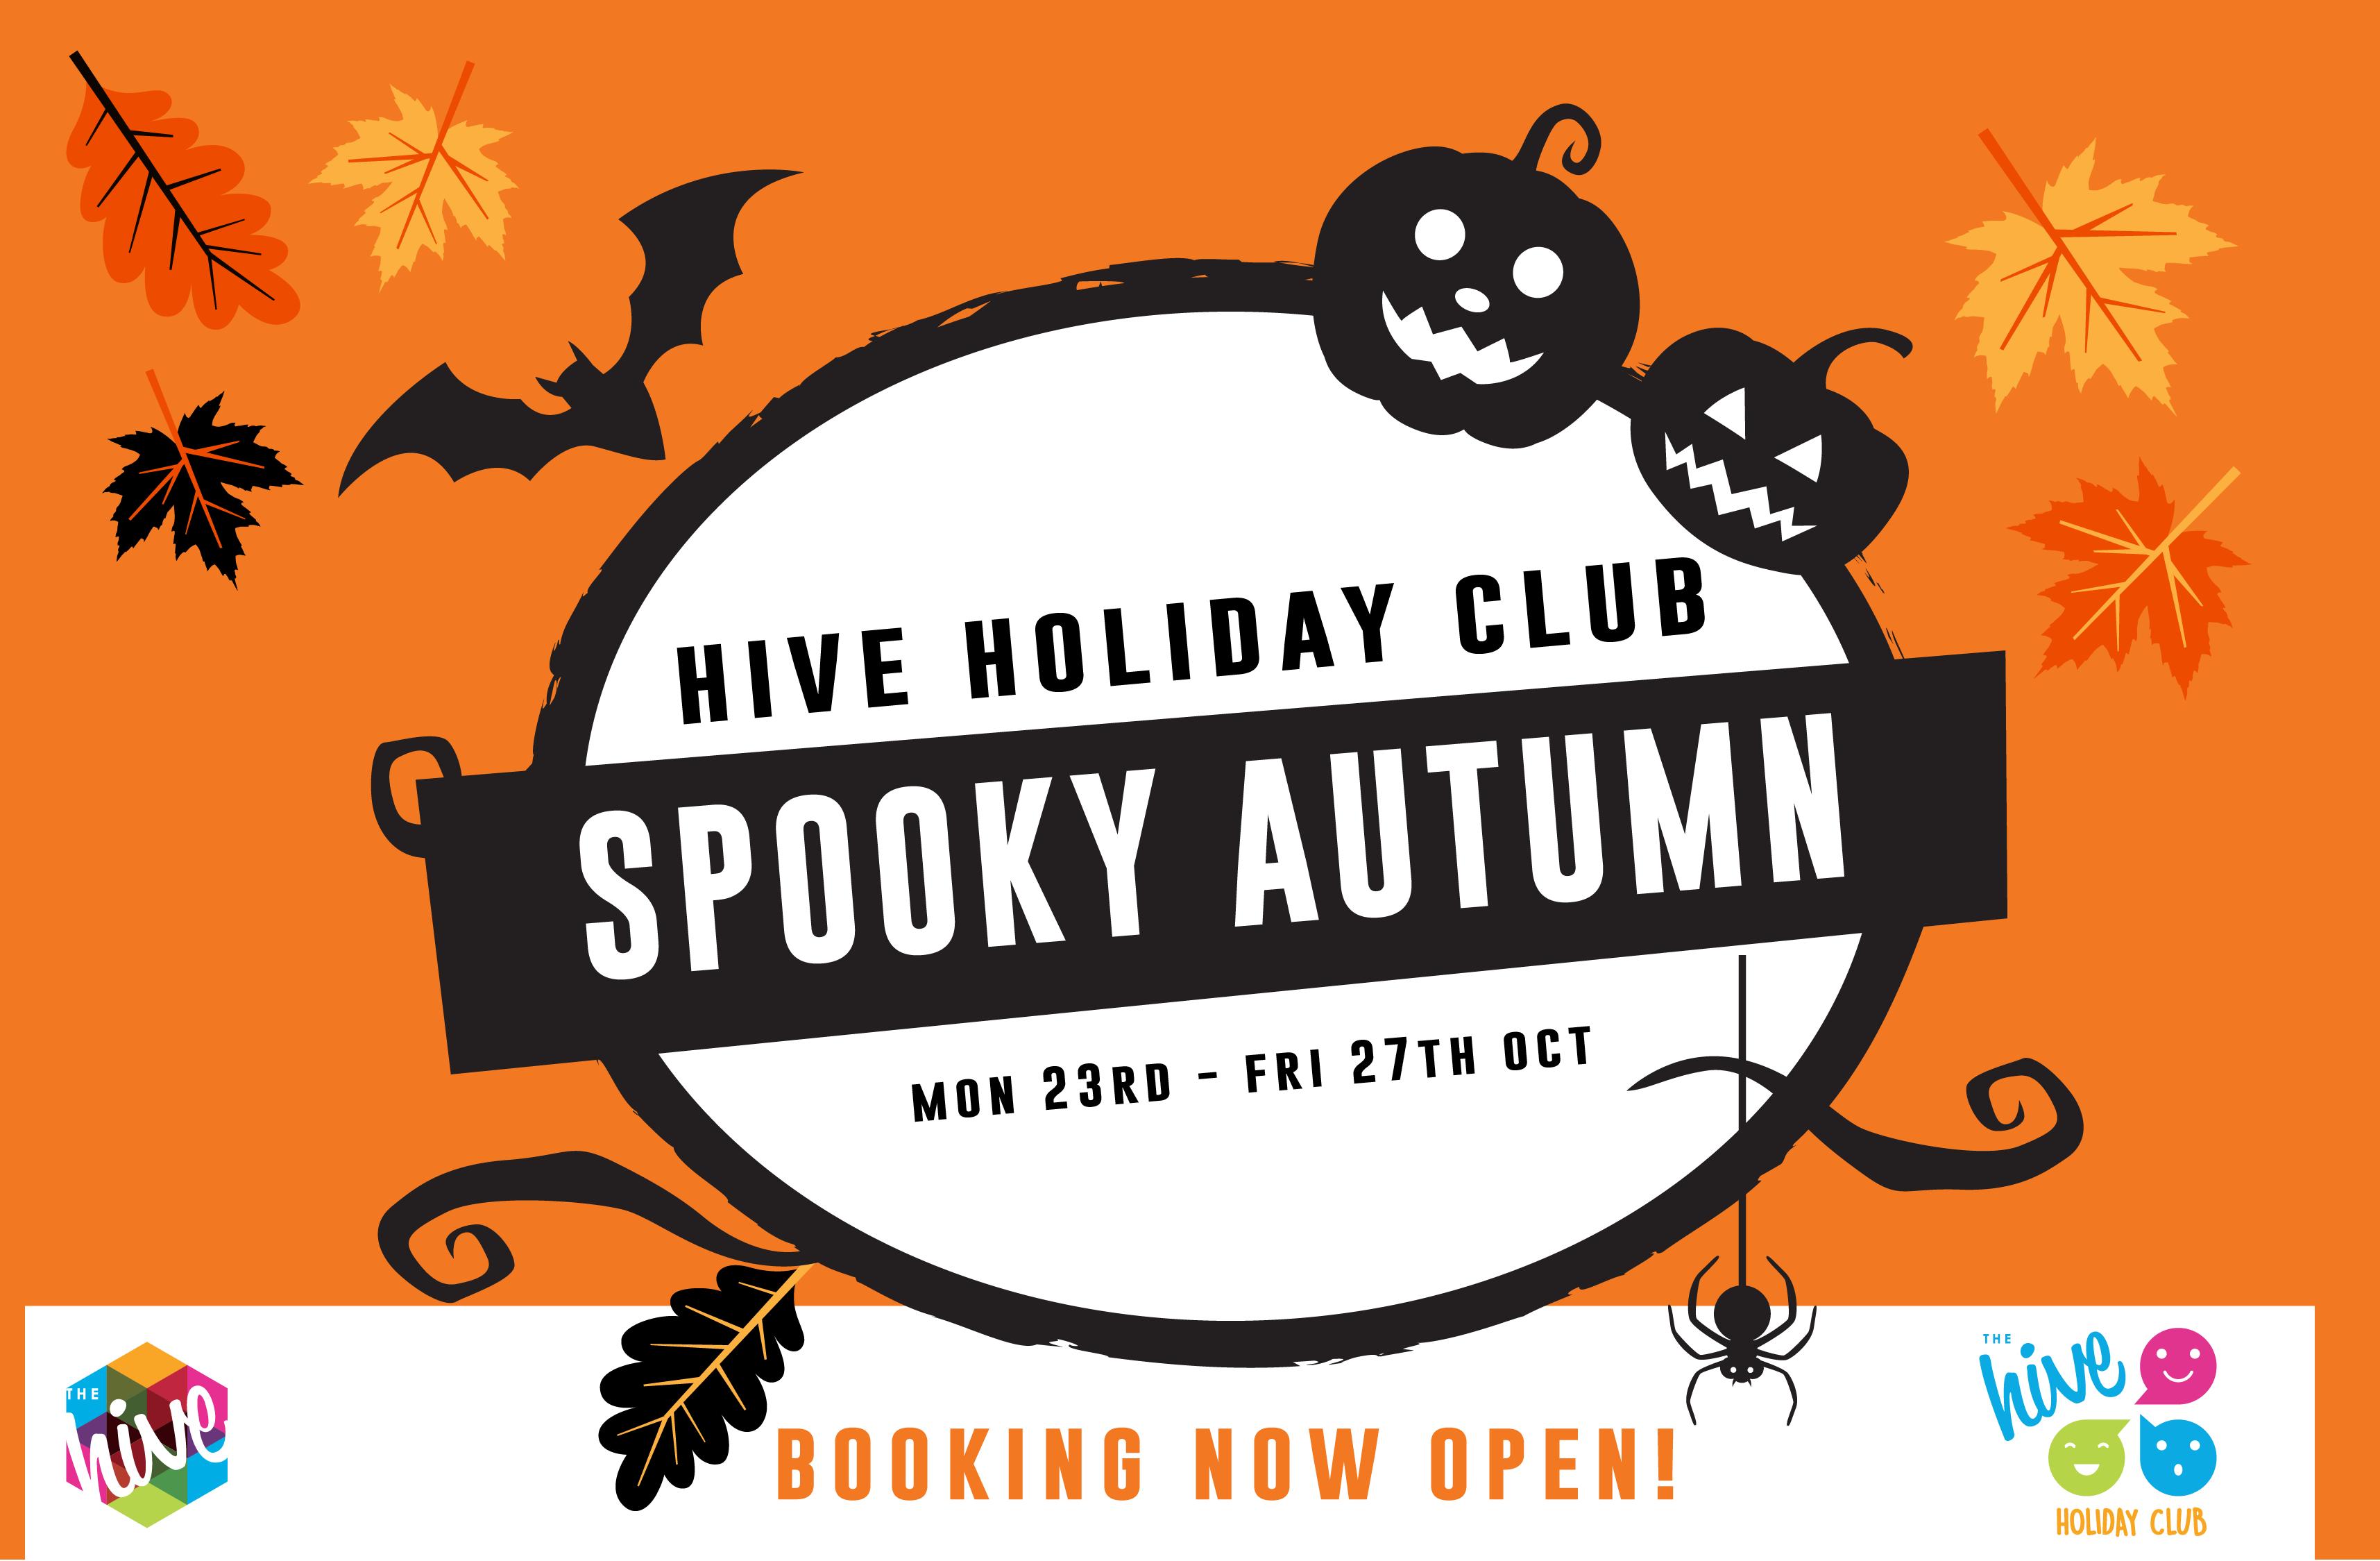 holiday club SPOOKY AUTUMN